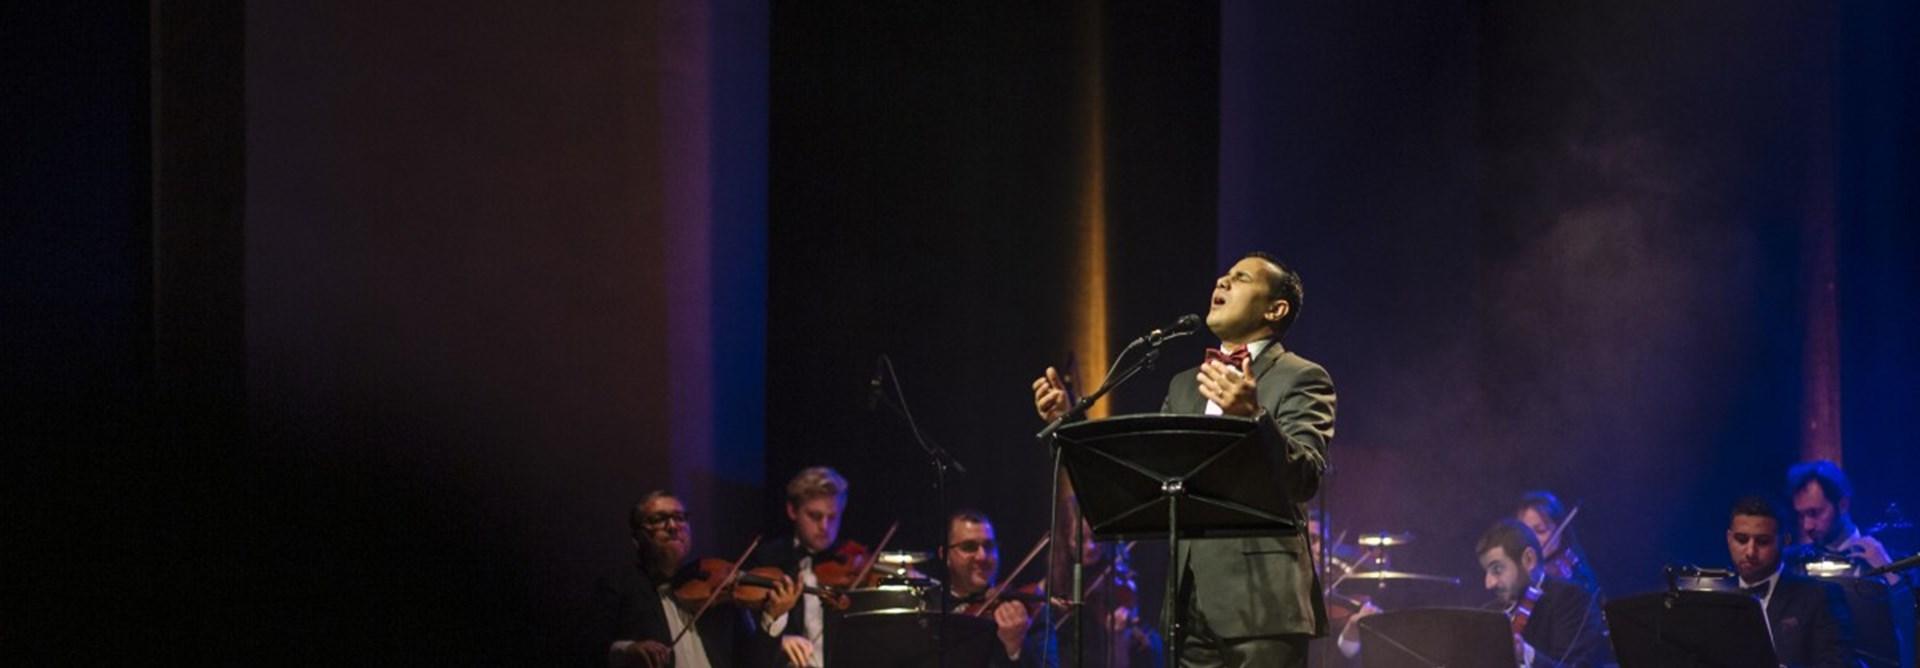 Amsterdams Andalusisch Orkest & Youssef Jrifi @ De Lieve Vrouw